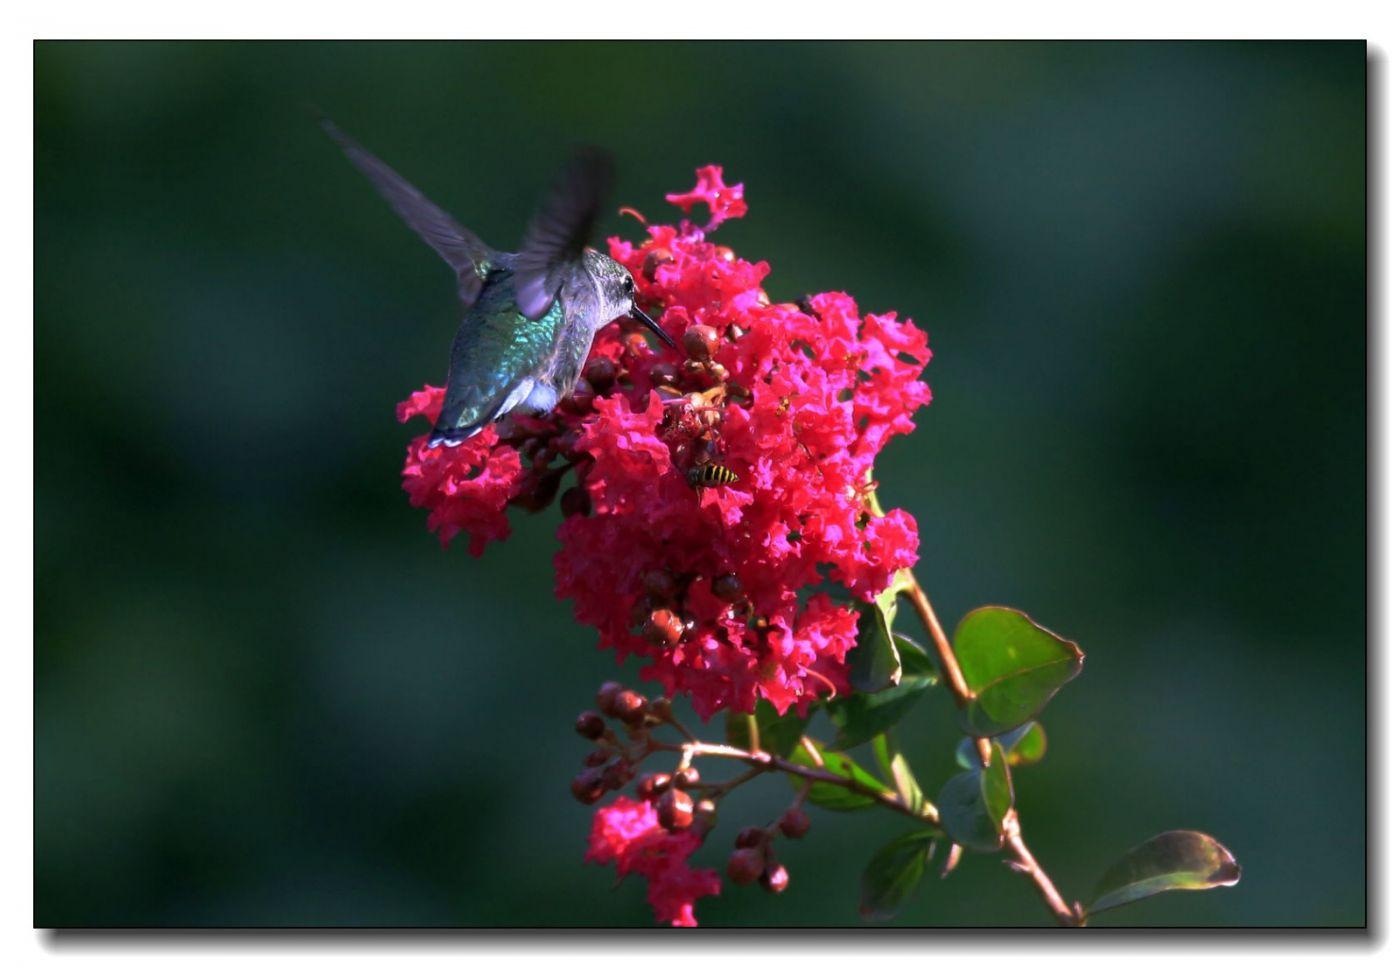 蜂鸟组图(六)_图1-7